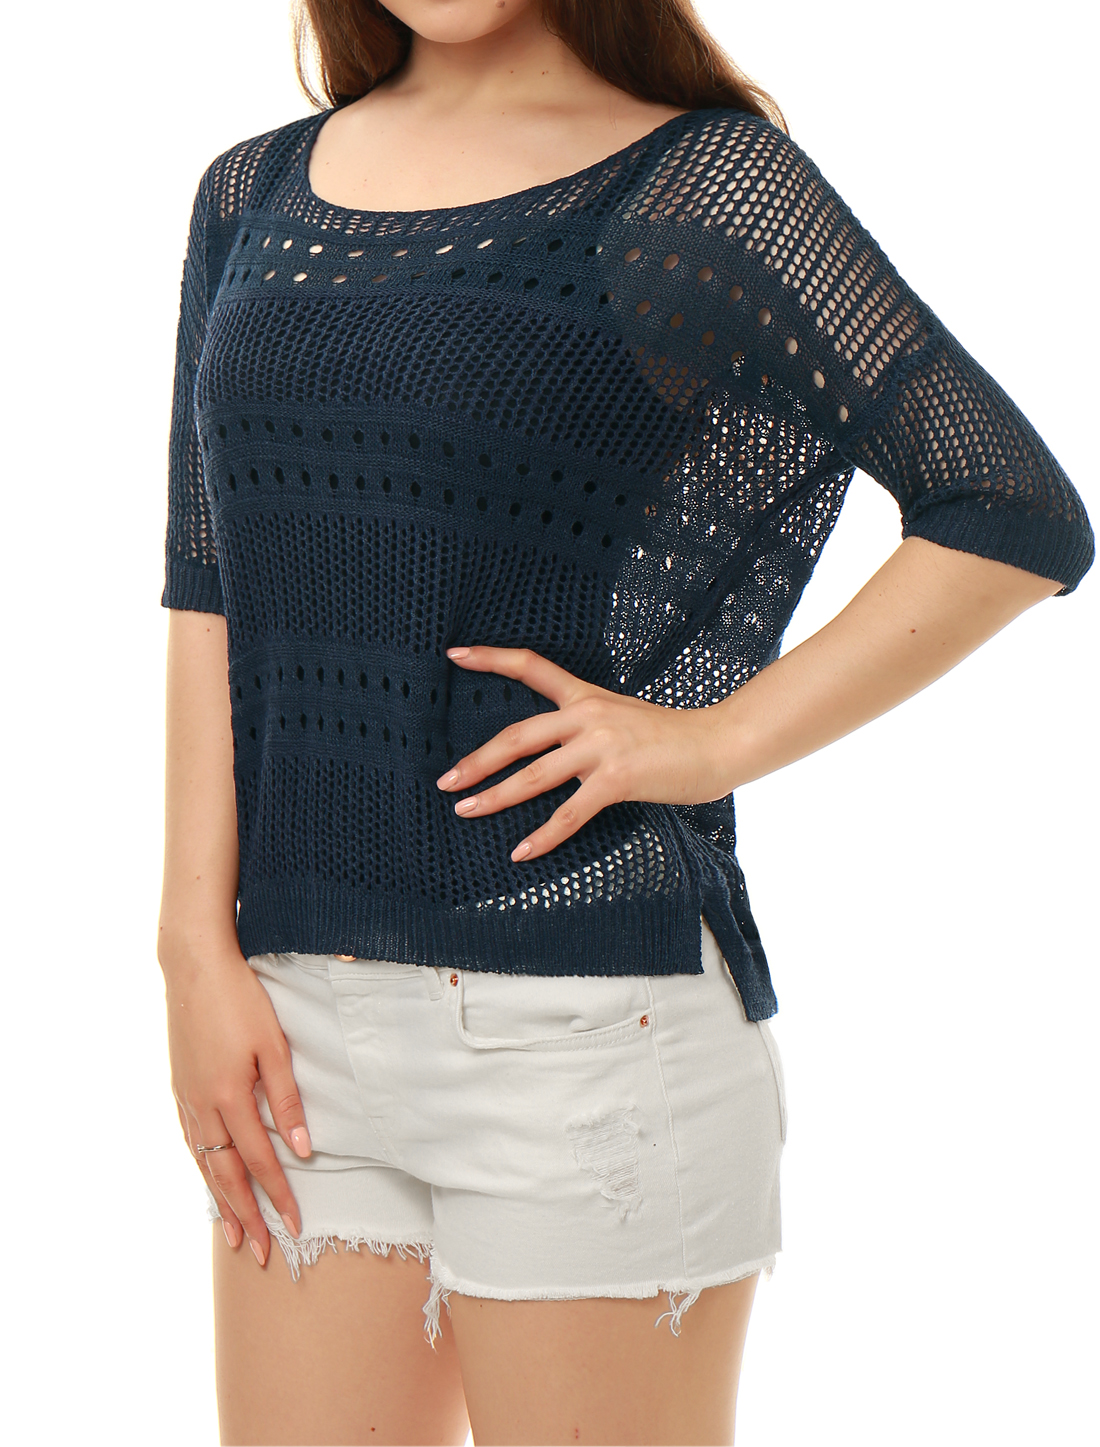 Allegra K Ladies Elbow Sleeves Hollow Out High Low Hem Knit Shirt Blue XL